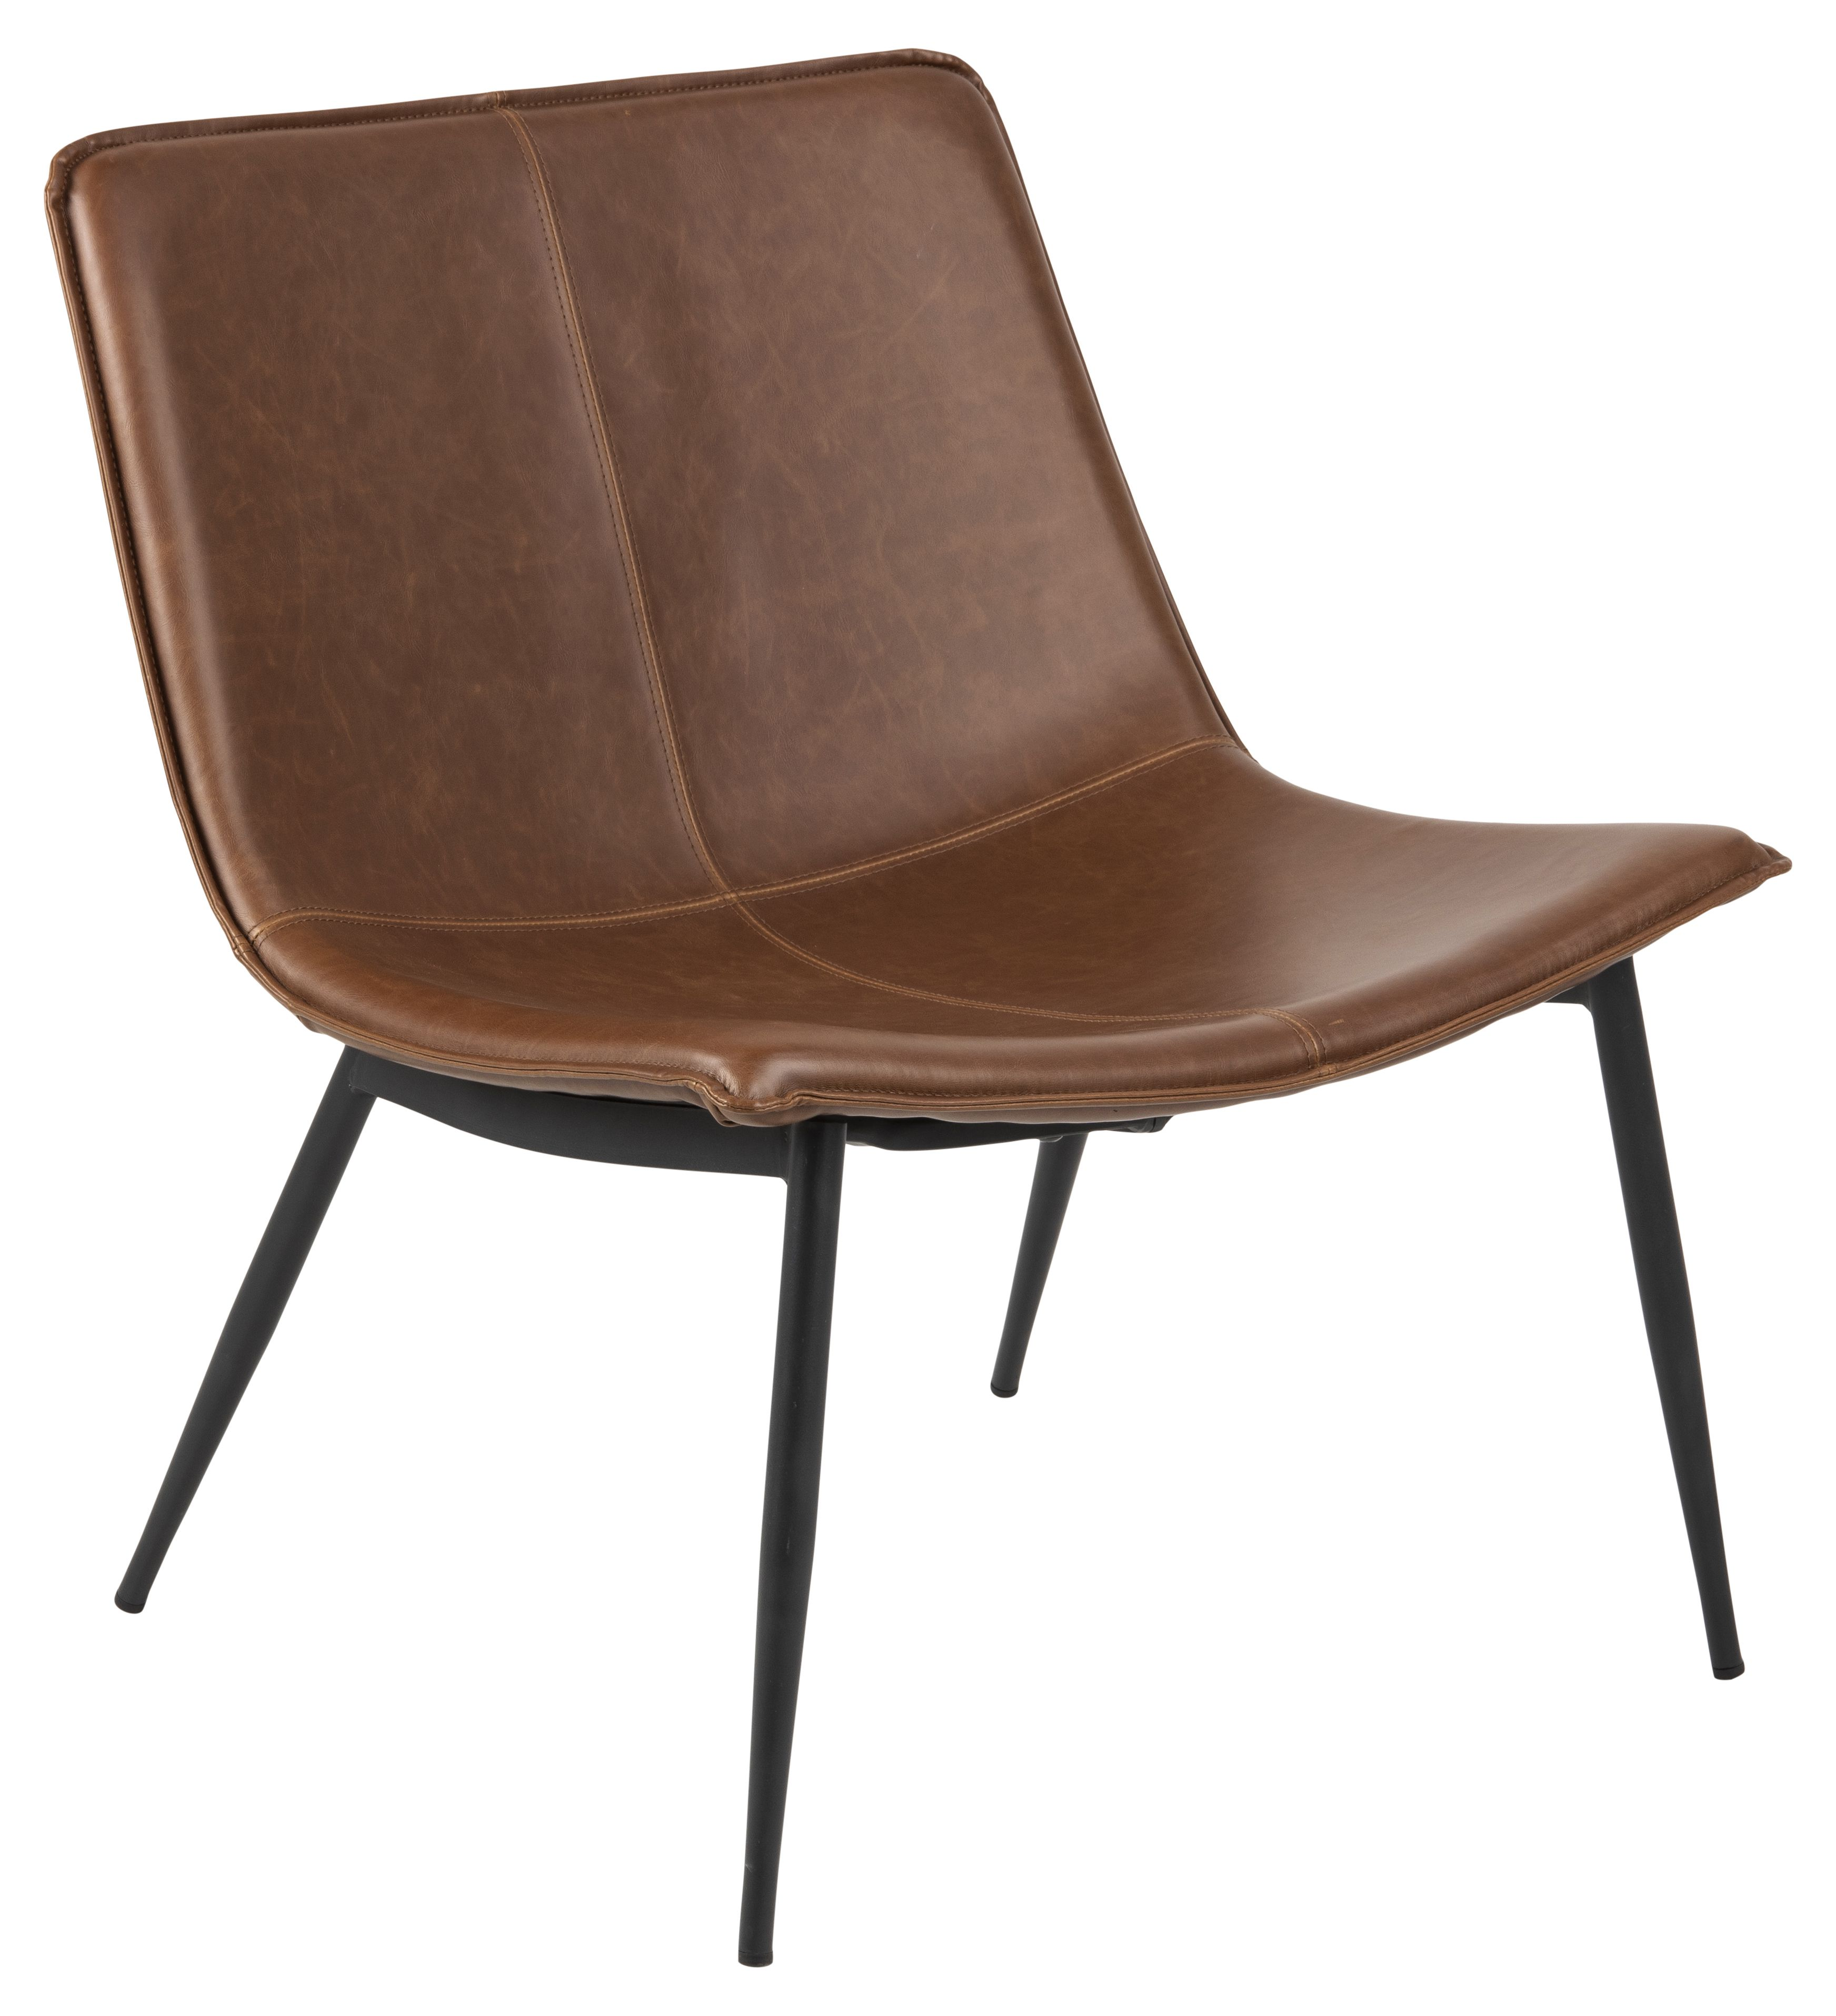 glesborg-fauteuil-1